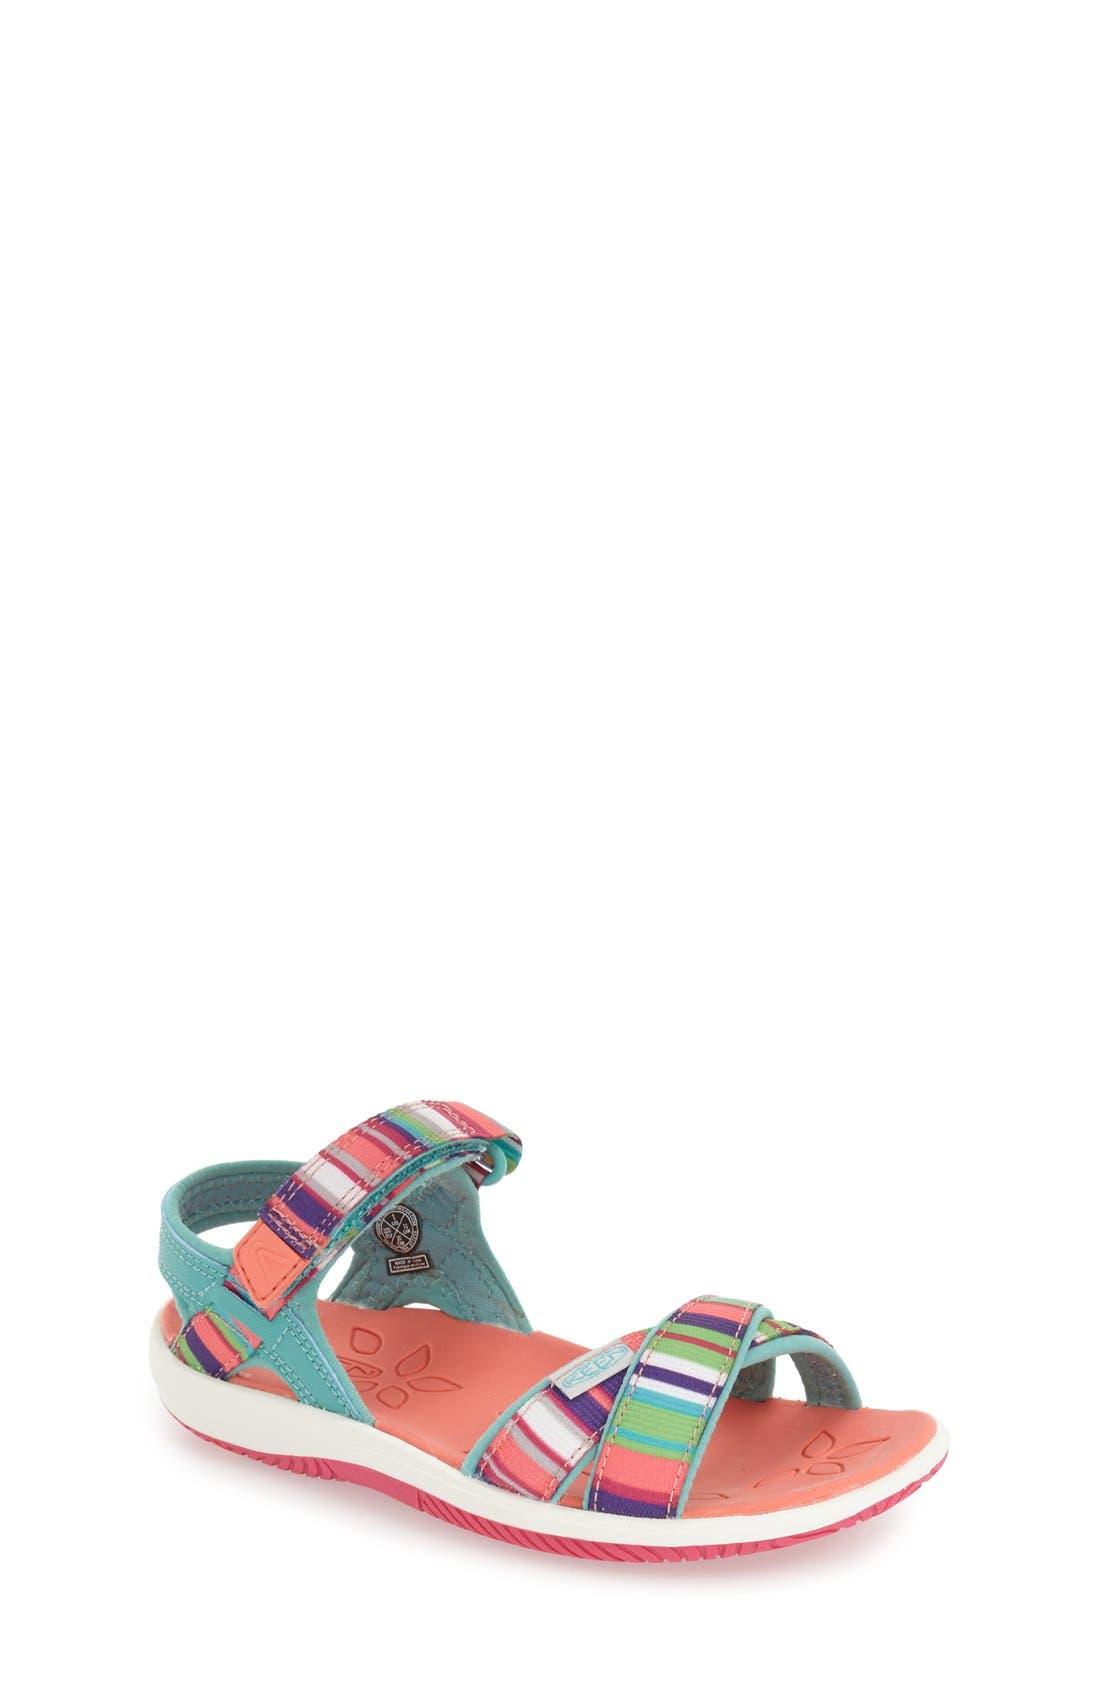 'Phoebe' Sandal,                         Main,                         color, 400